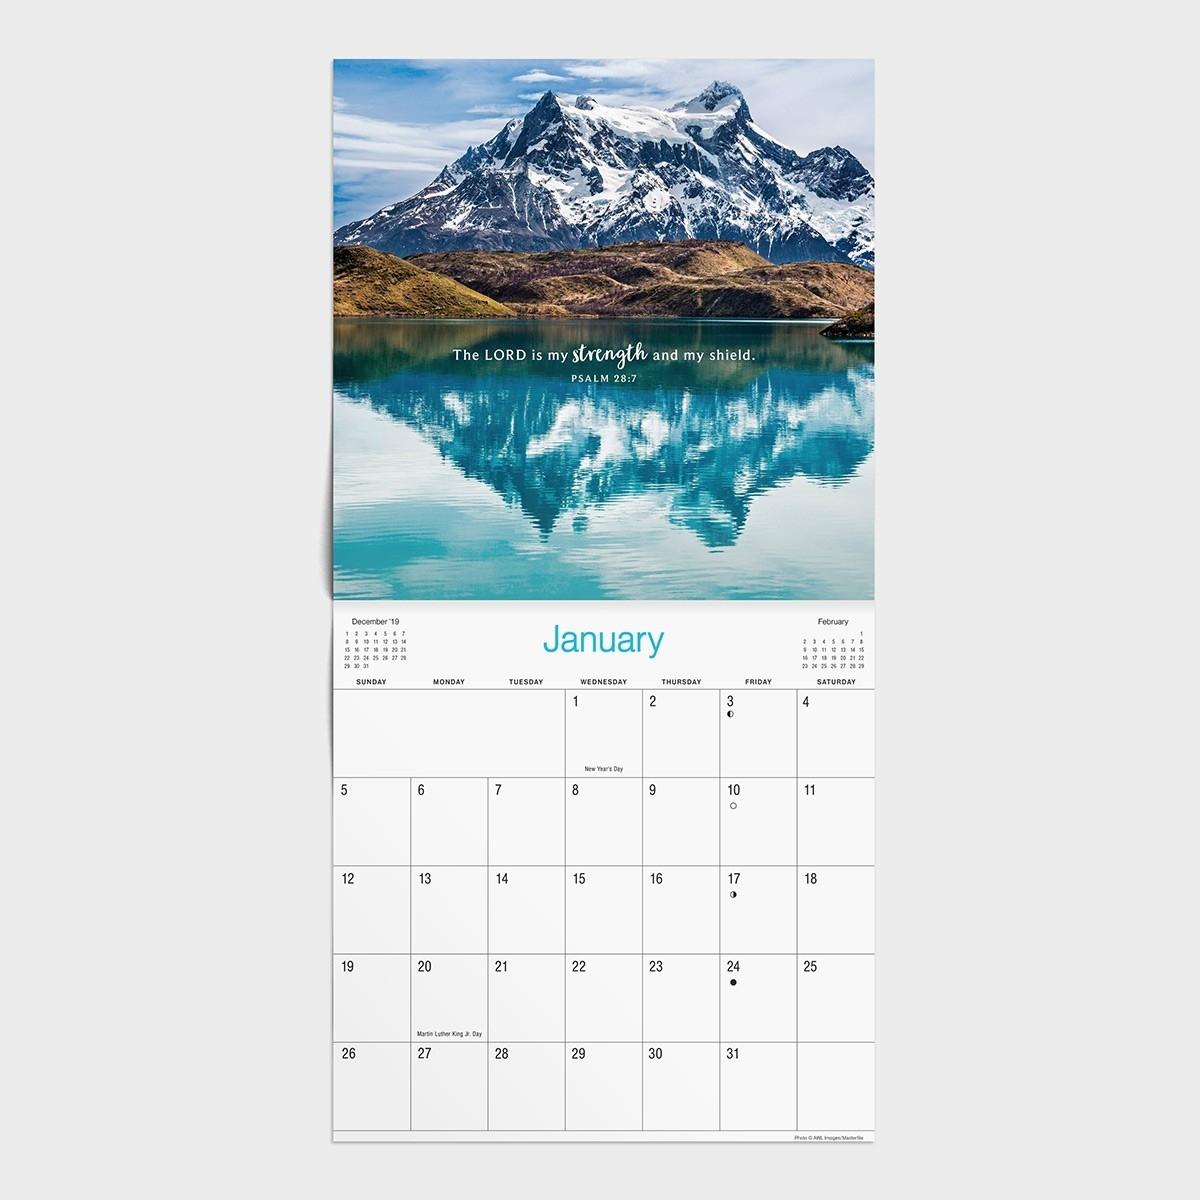 Psalms Trees - 2020 Wall Calendar  2020 Christian Advent Calendar With Scripture